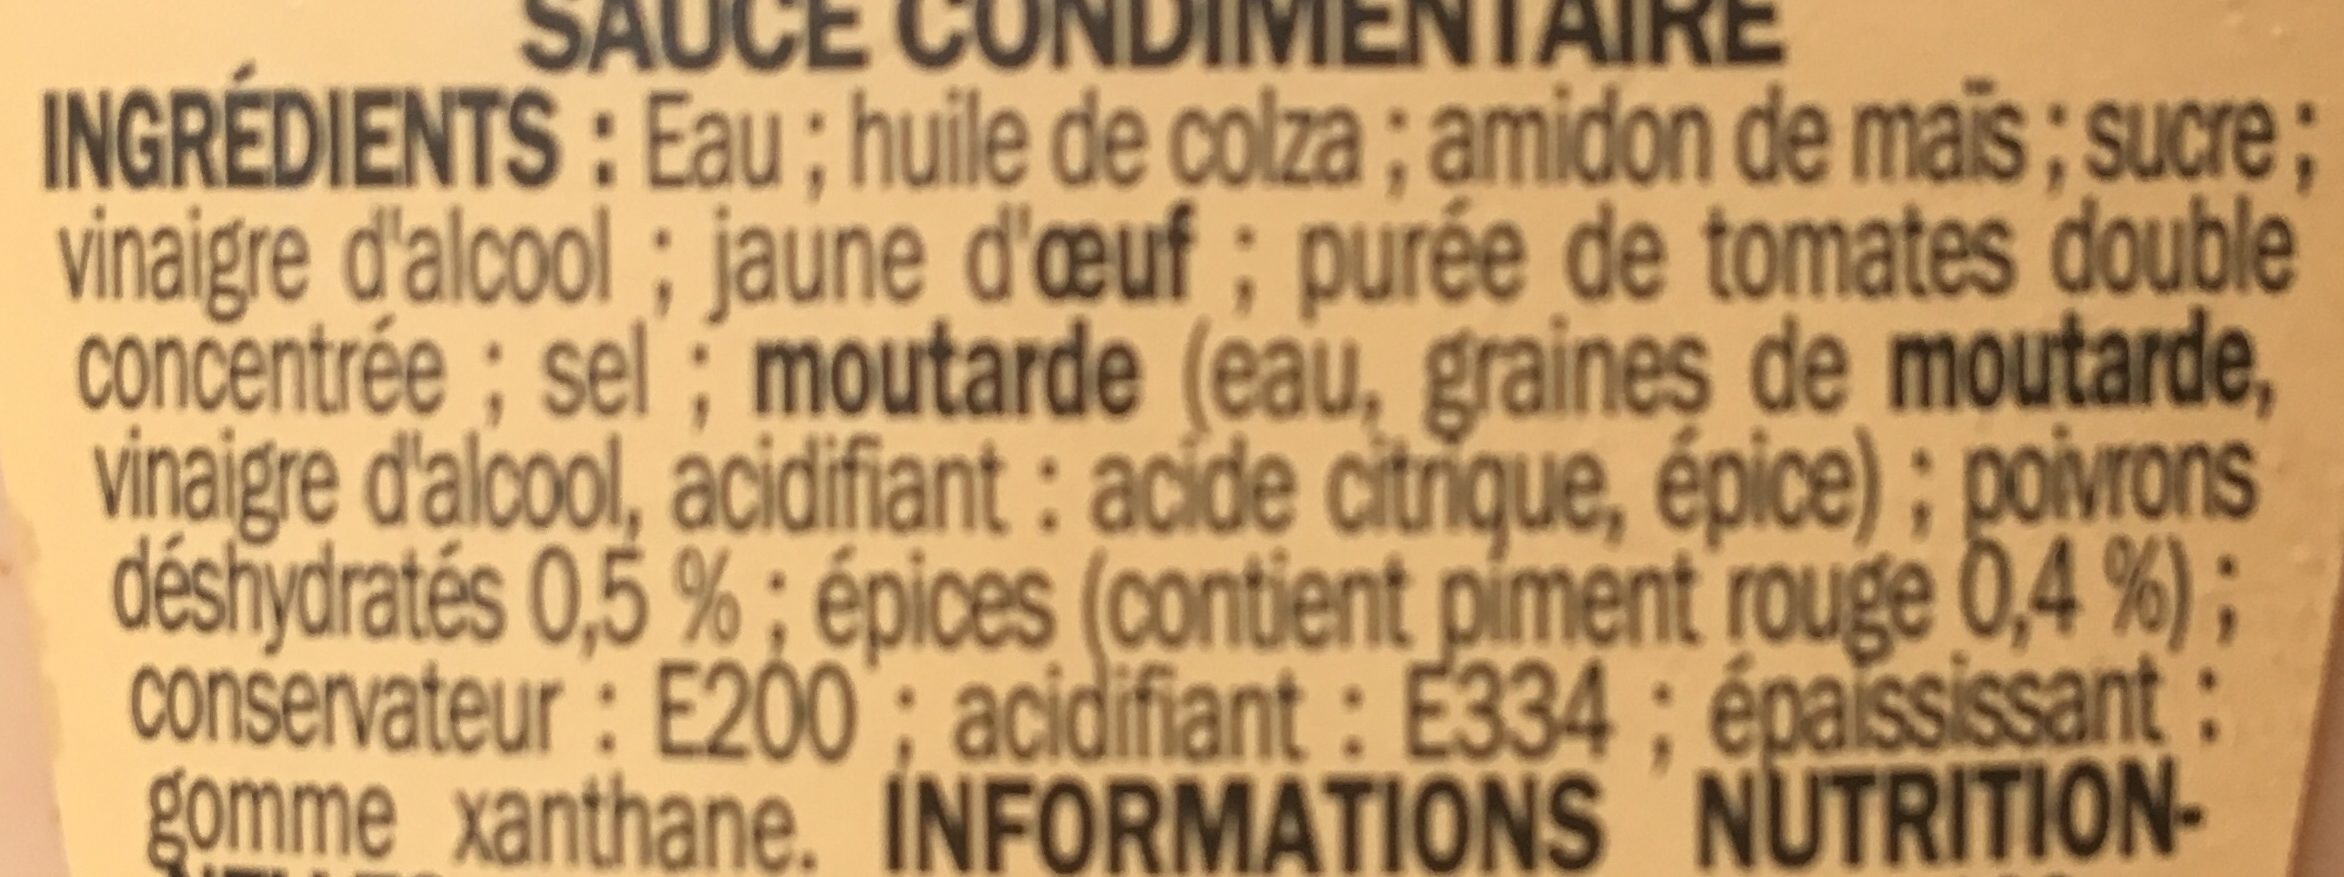 Sauce samouraï - flacon - Ingredients - fr